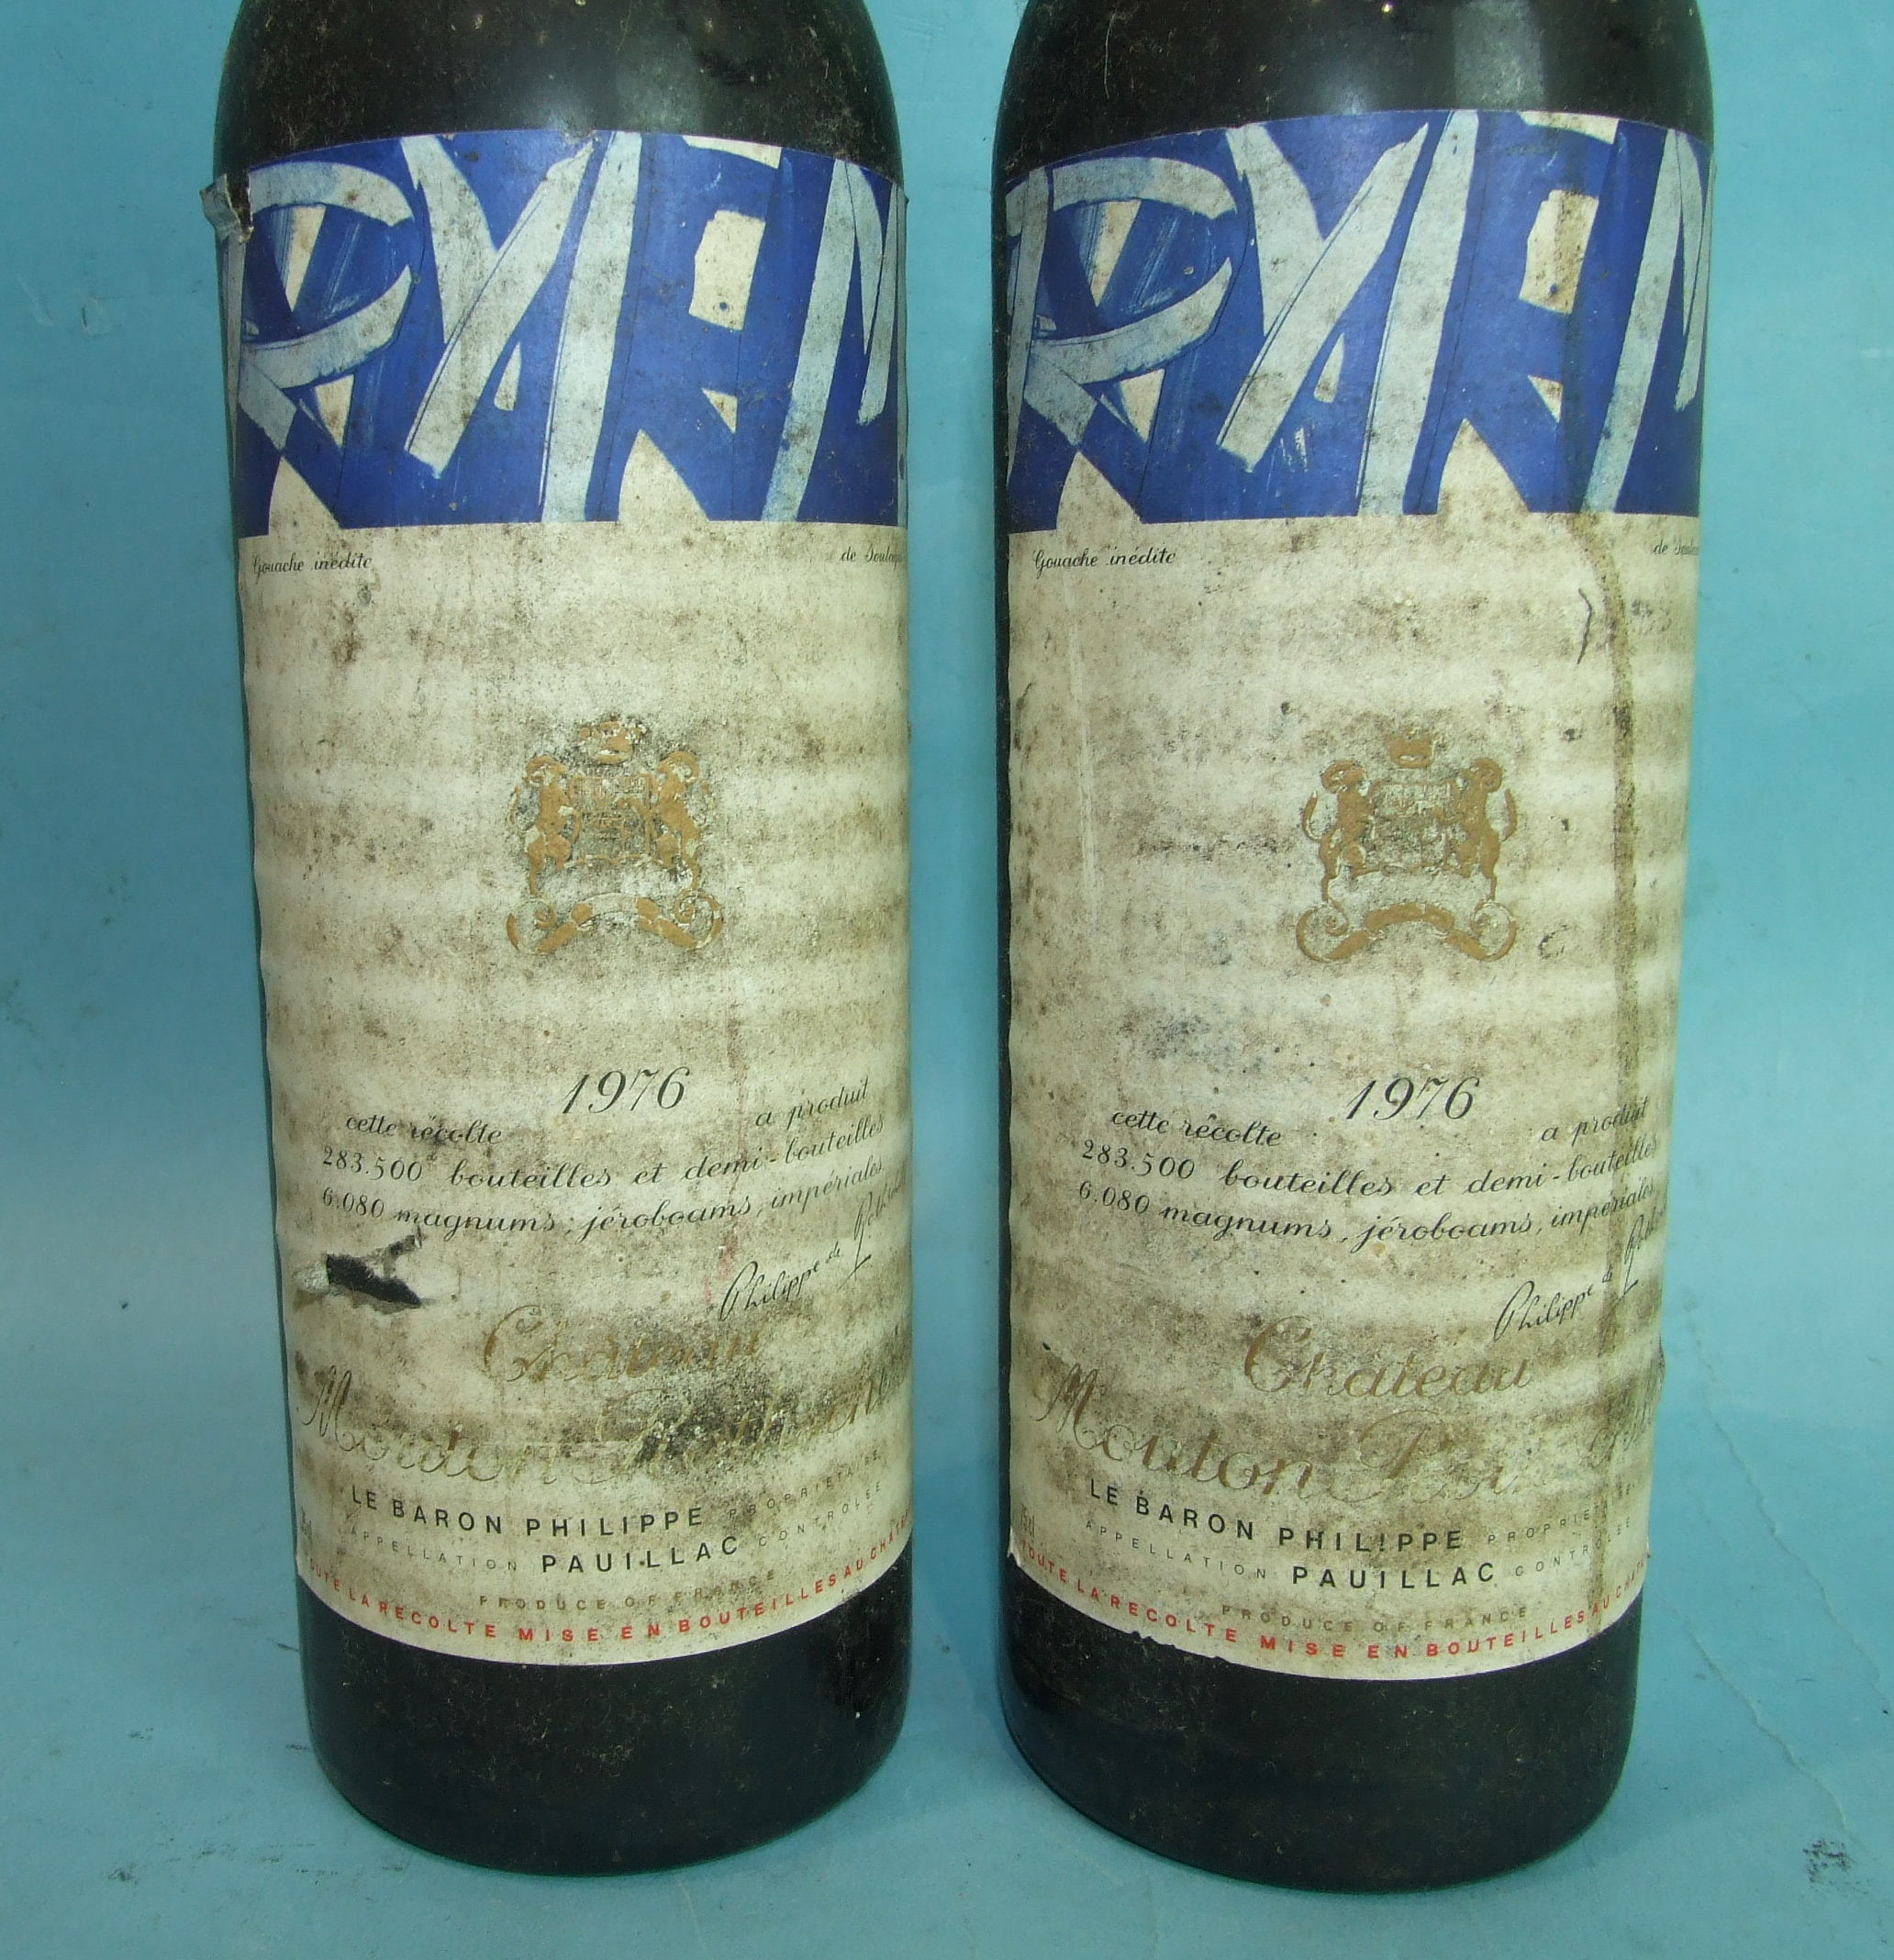 Lot 13 - Chateau Mouton Rothschild 1976, 1er Grand Cru Classé, two bottles, labels soiled, high shoulder